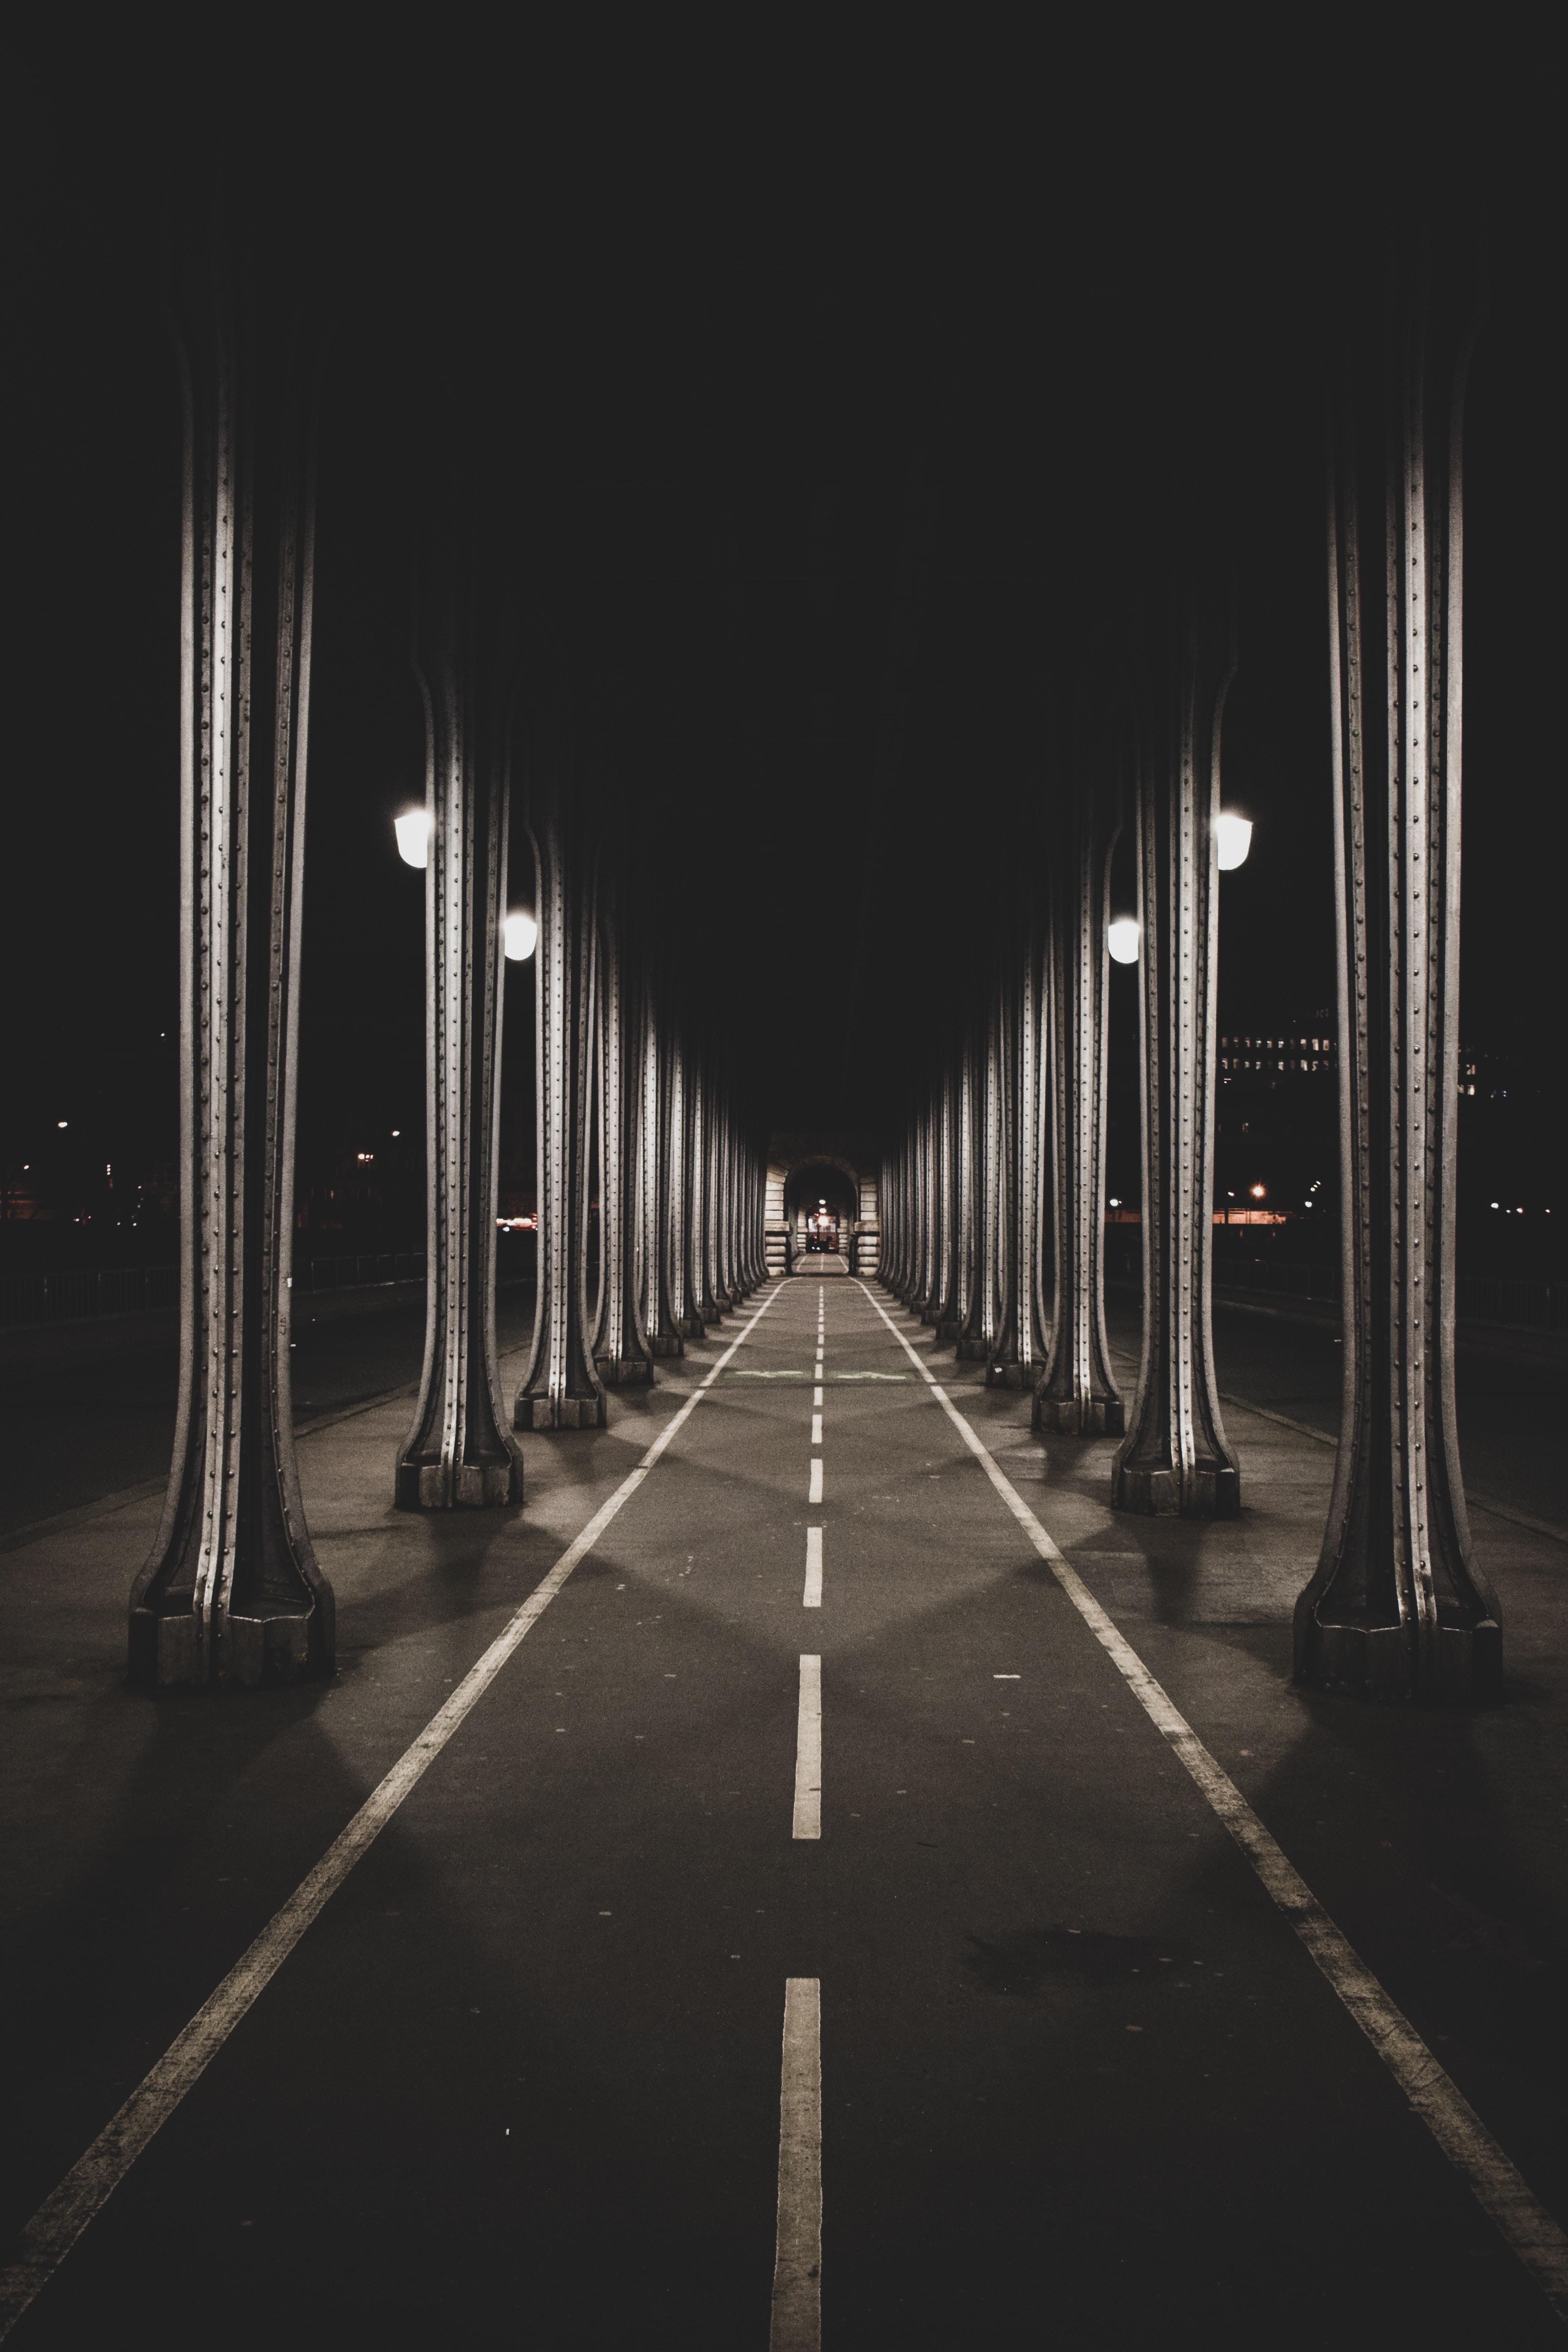 road under gray bridge